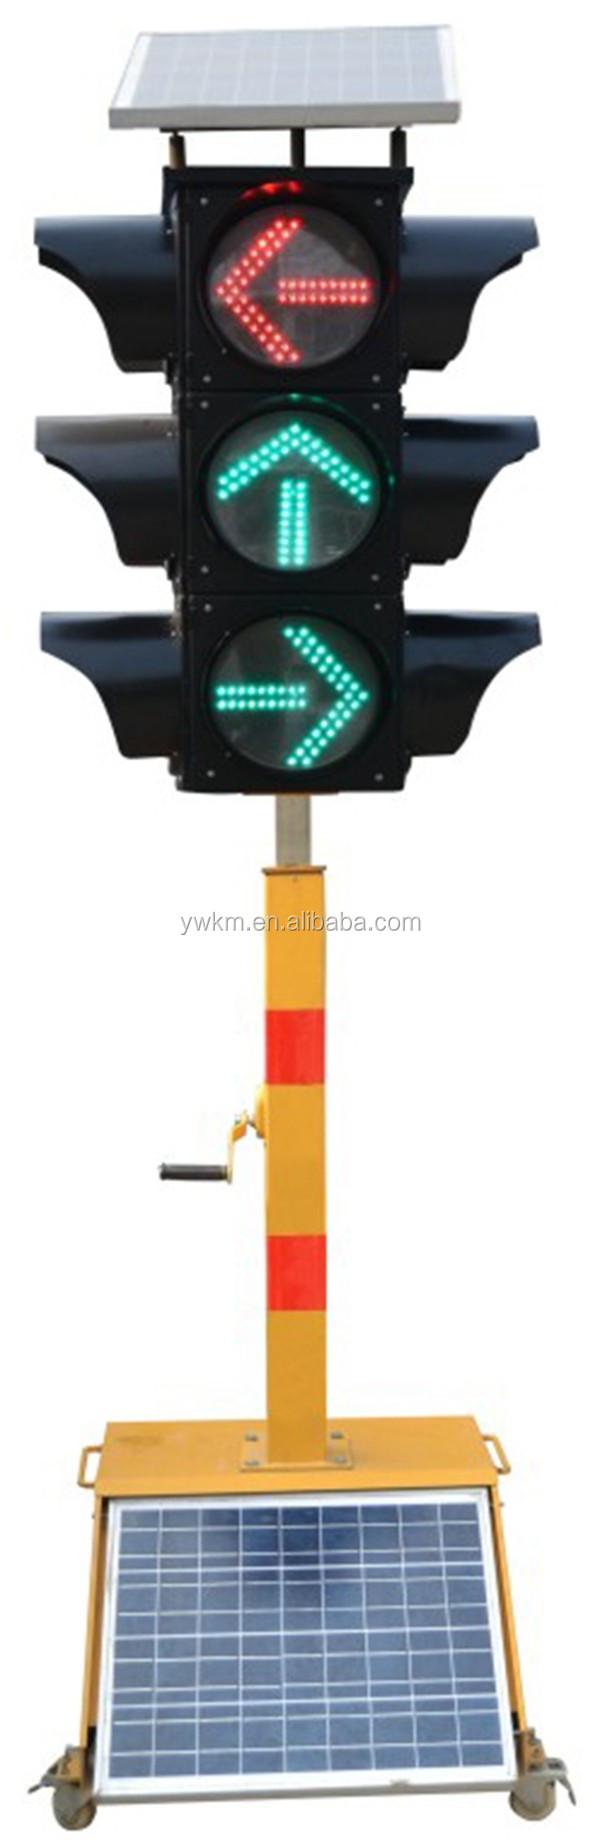 Pedestrian Crossing Movable Led Solar Signal Light